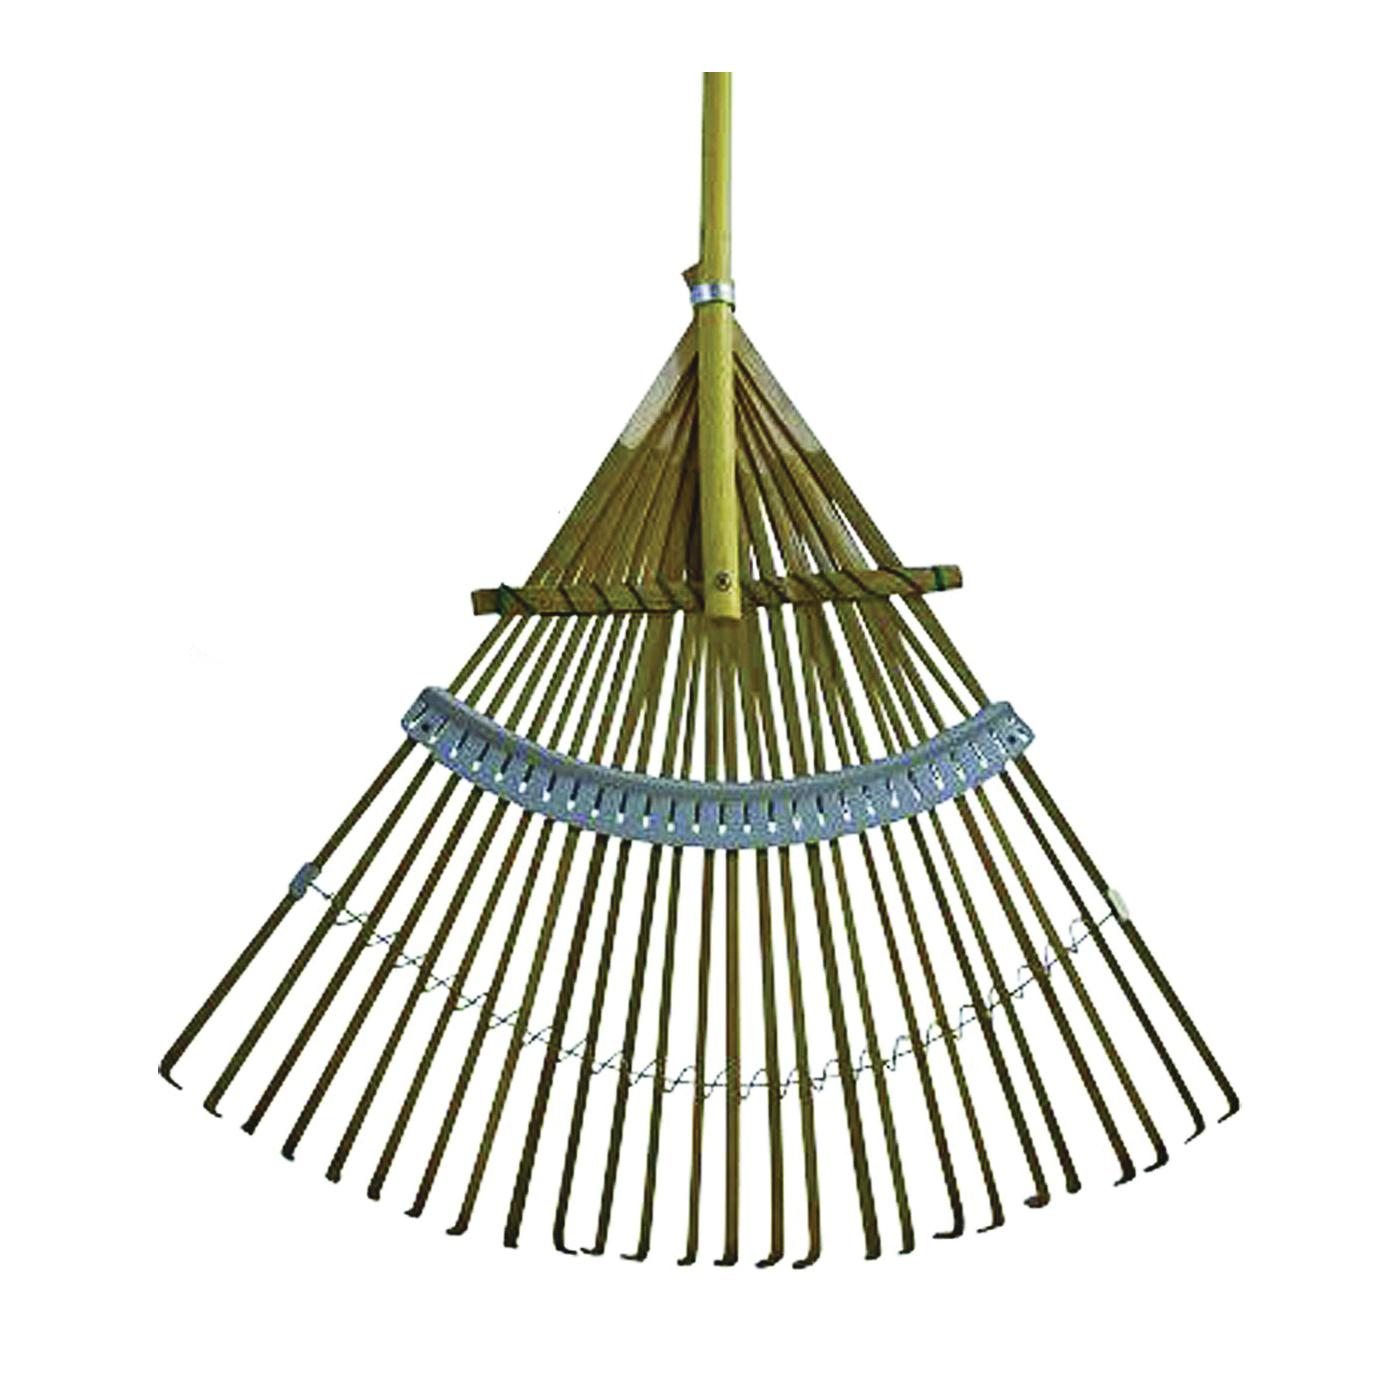 Picture of Flexrake CFP24 Leaf Rake, Bamboo Tine, Hardwood Handle, 48 in L Handle